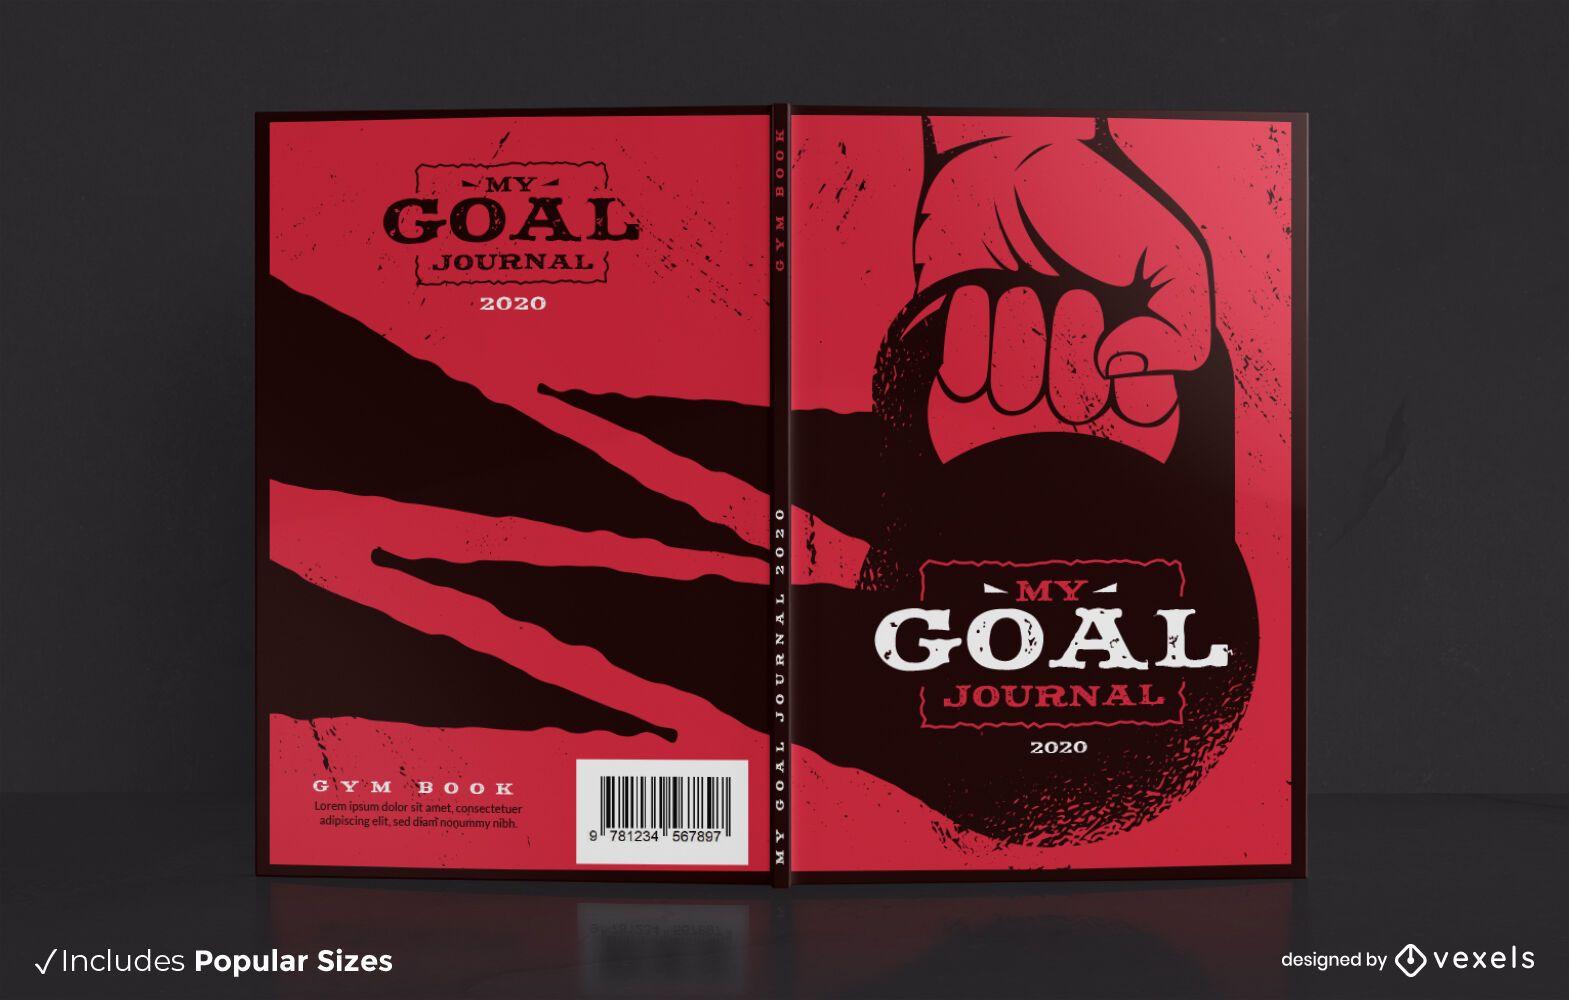 Gym Journal Book Cover Design